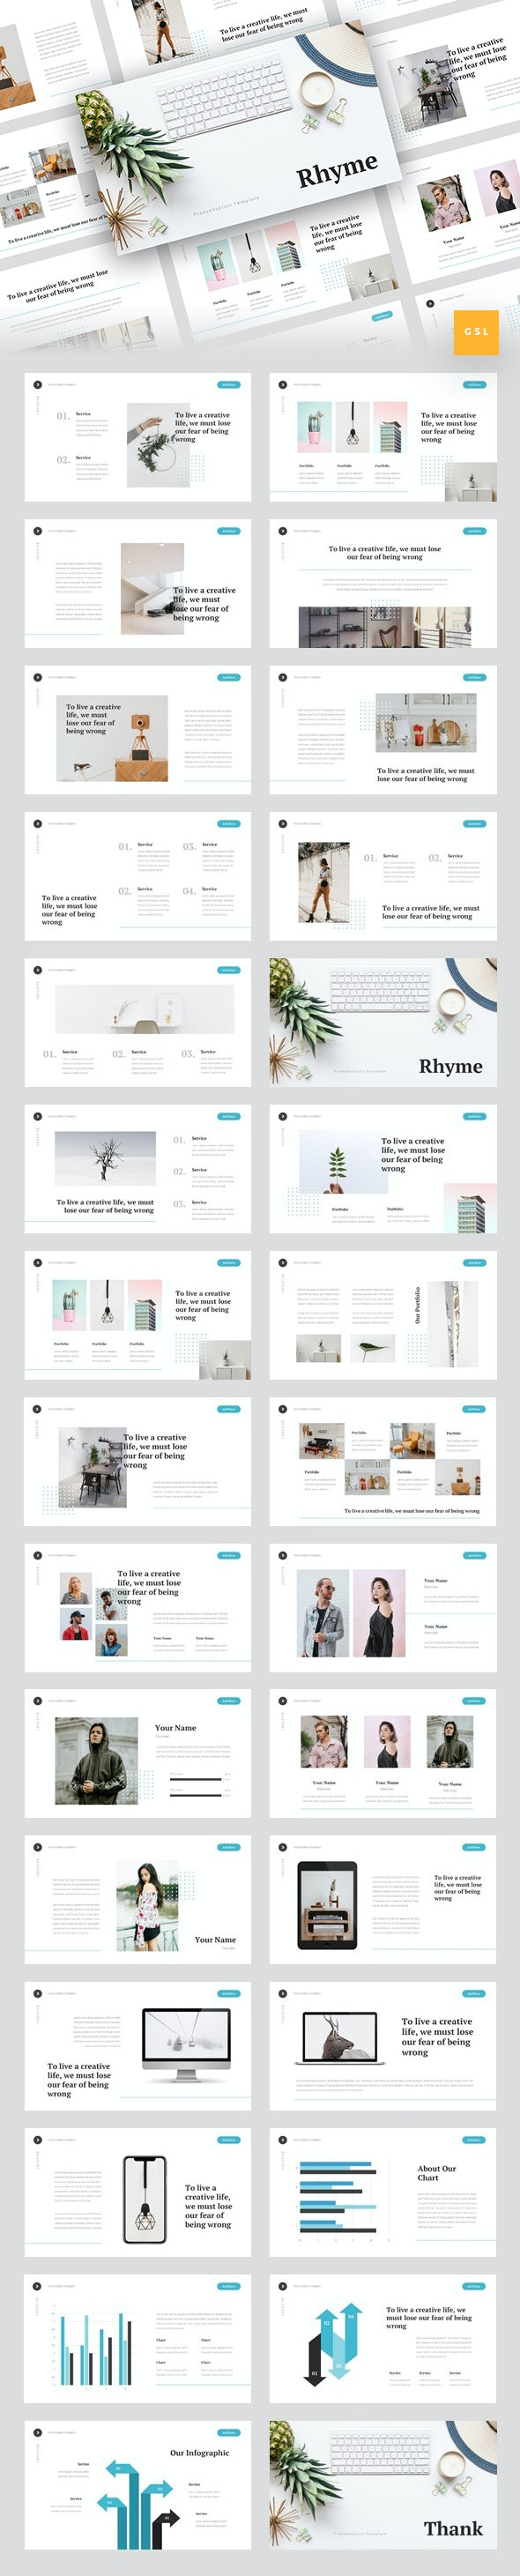 Rhyme - Creative Google Slides Template - Google Slides Presentation Templates